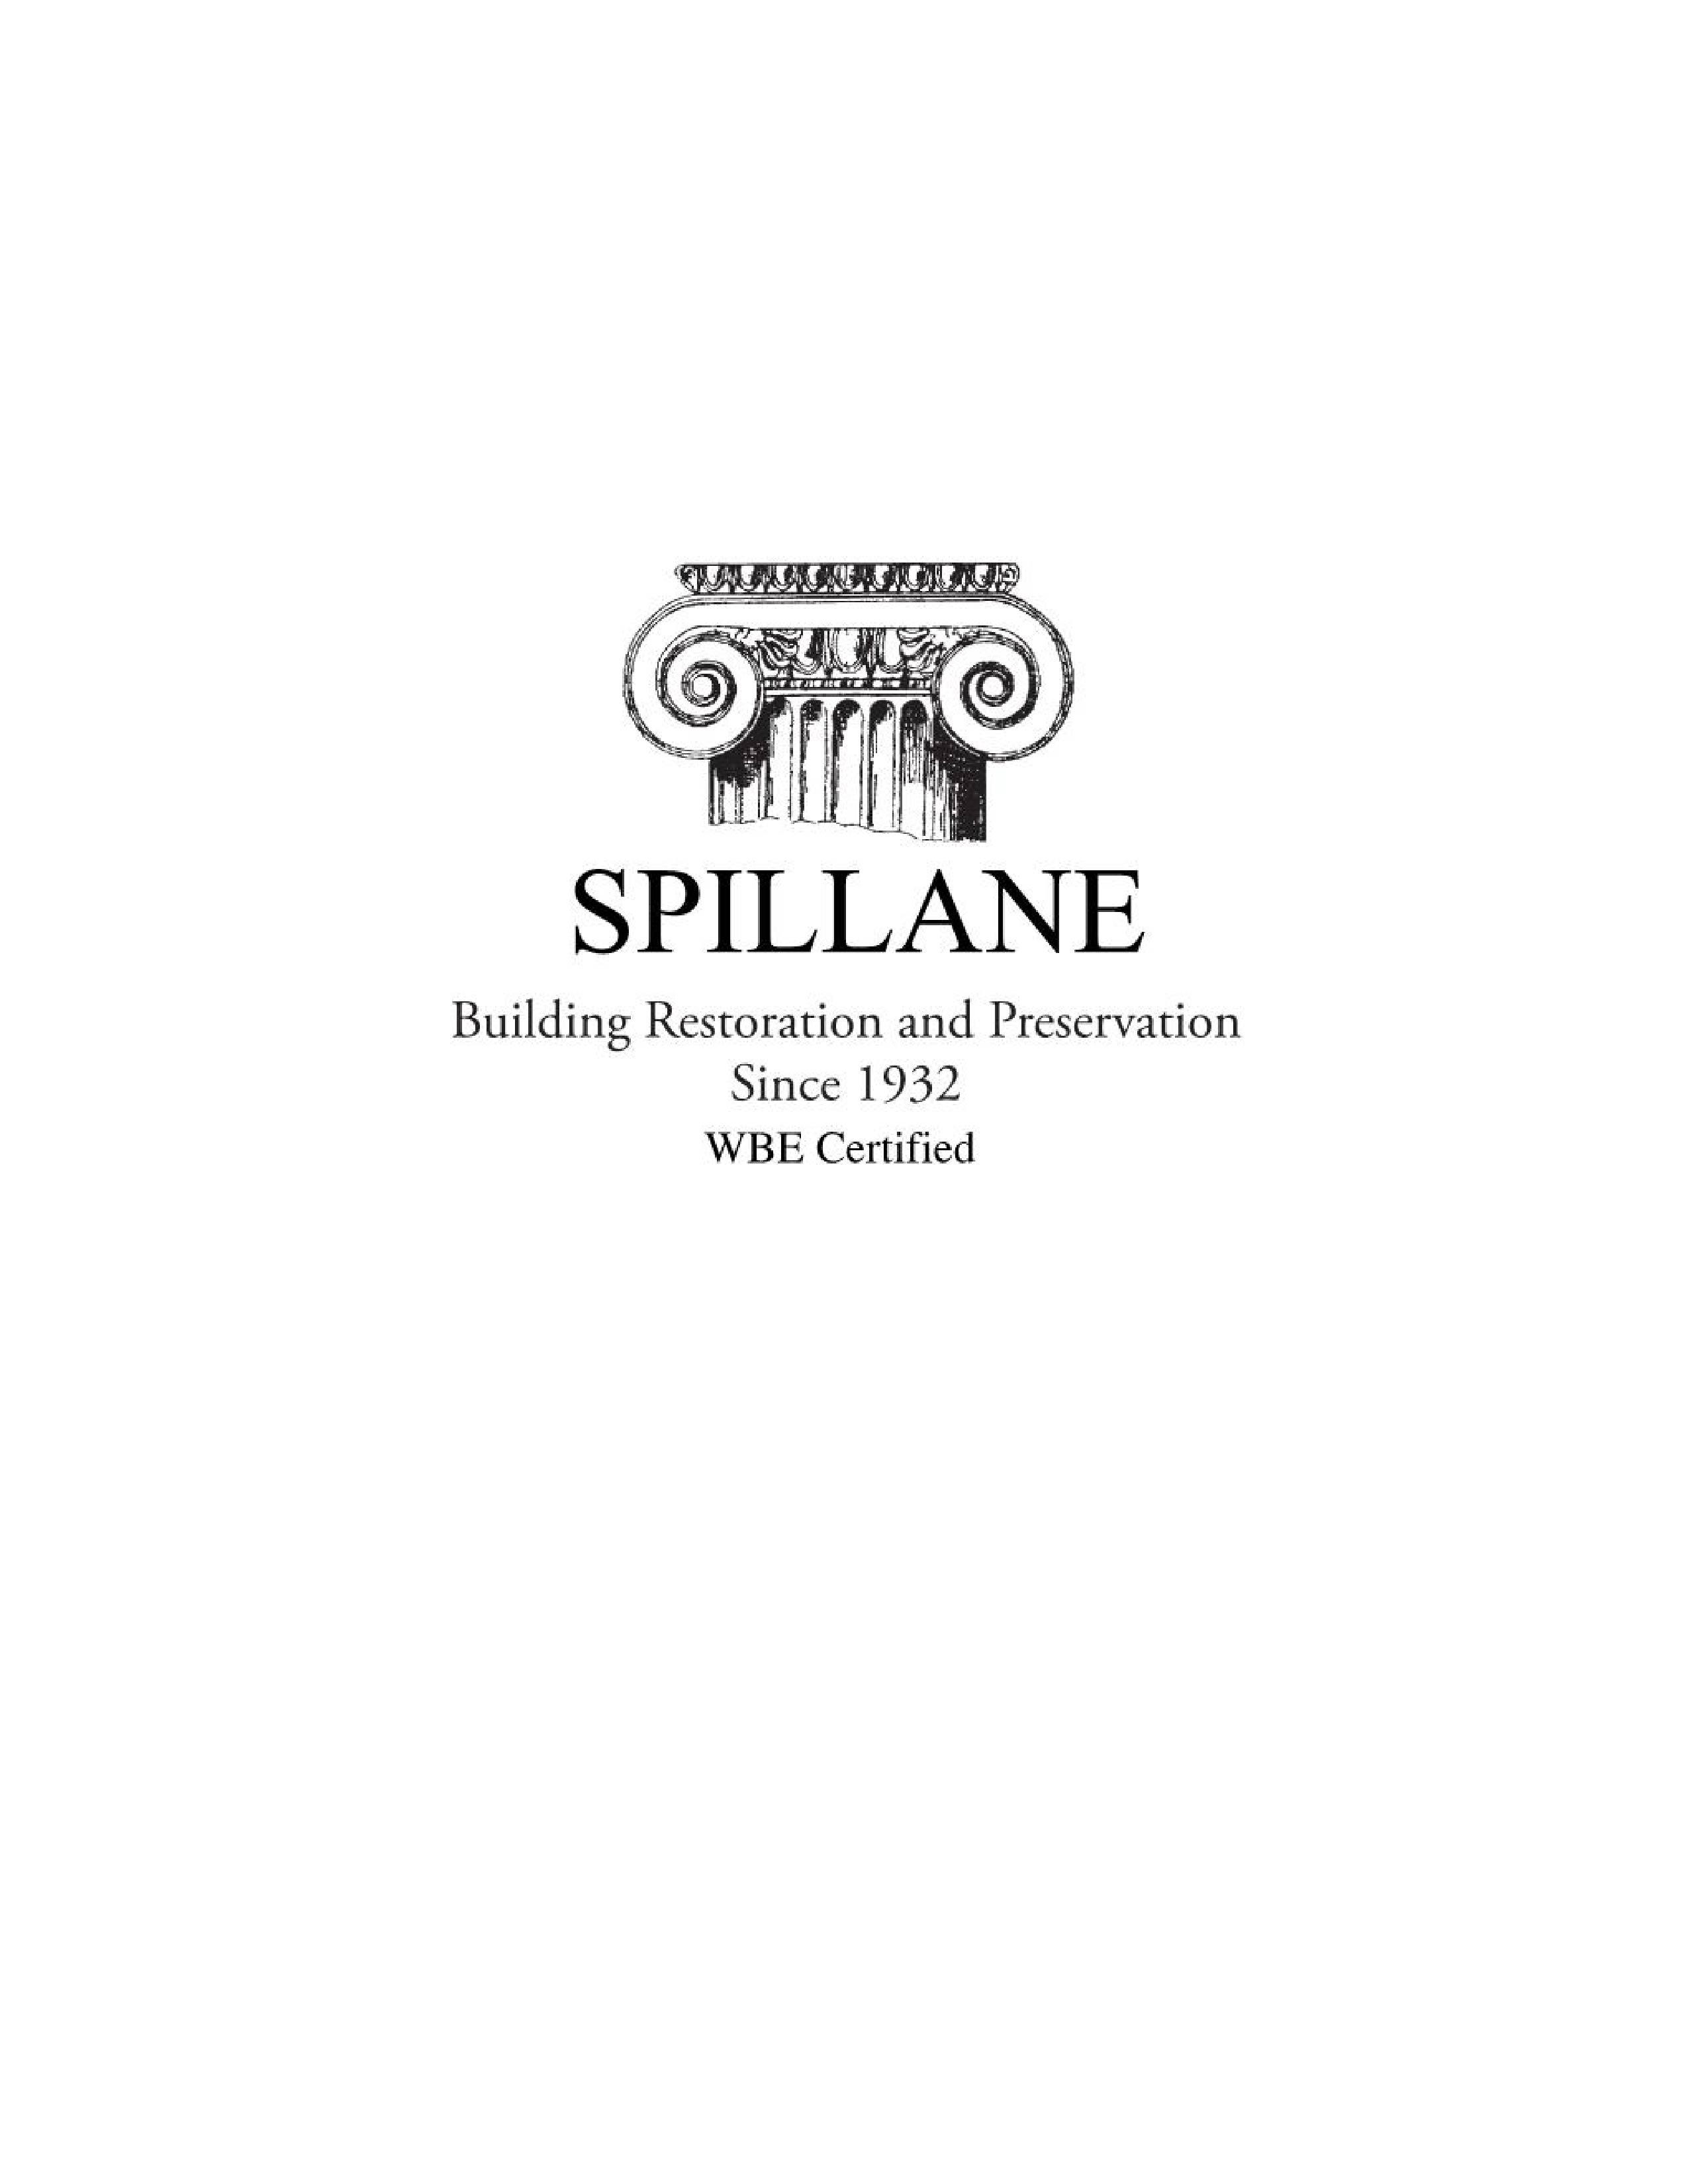 P. J. Spillane Company, Inc. logo